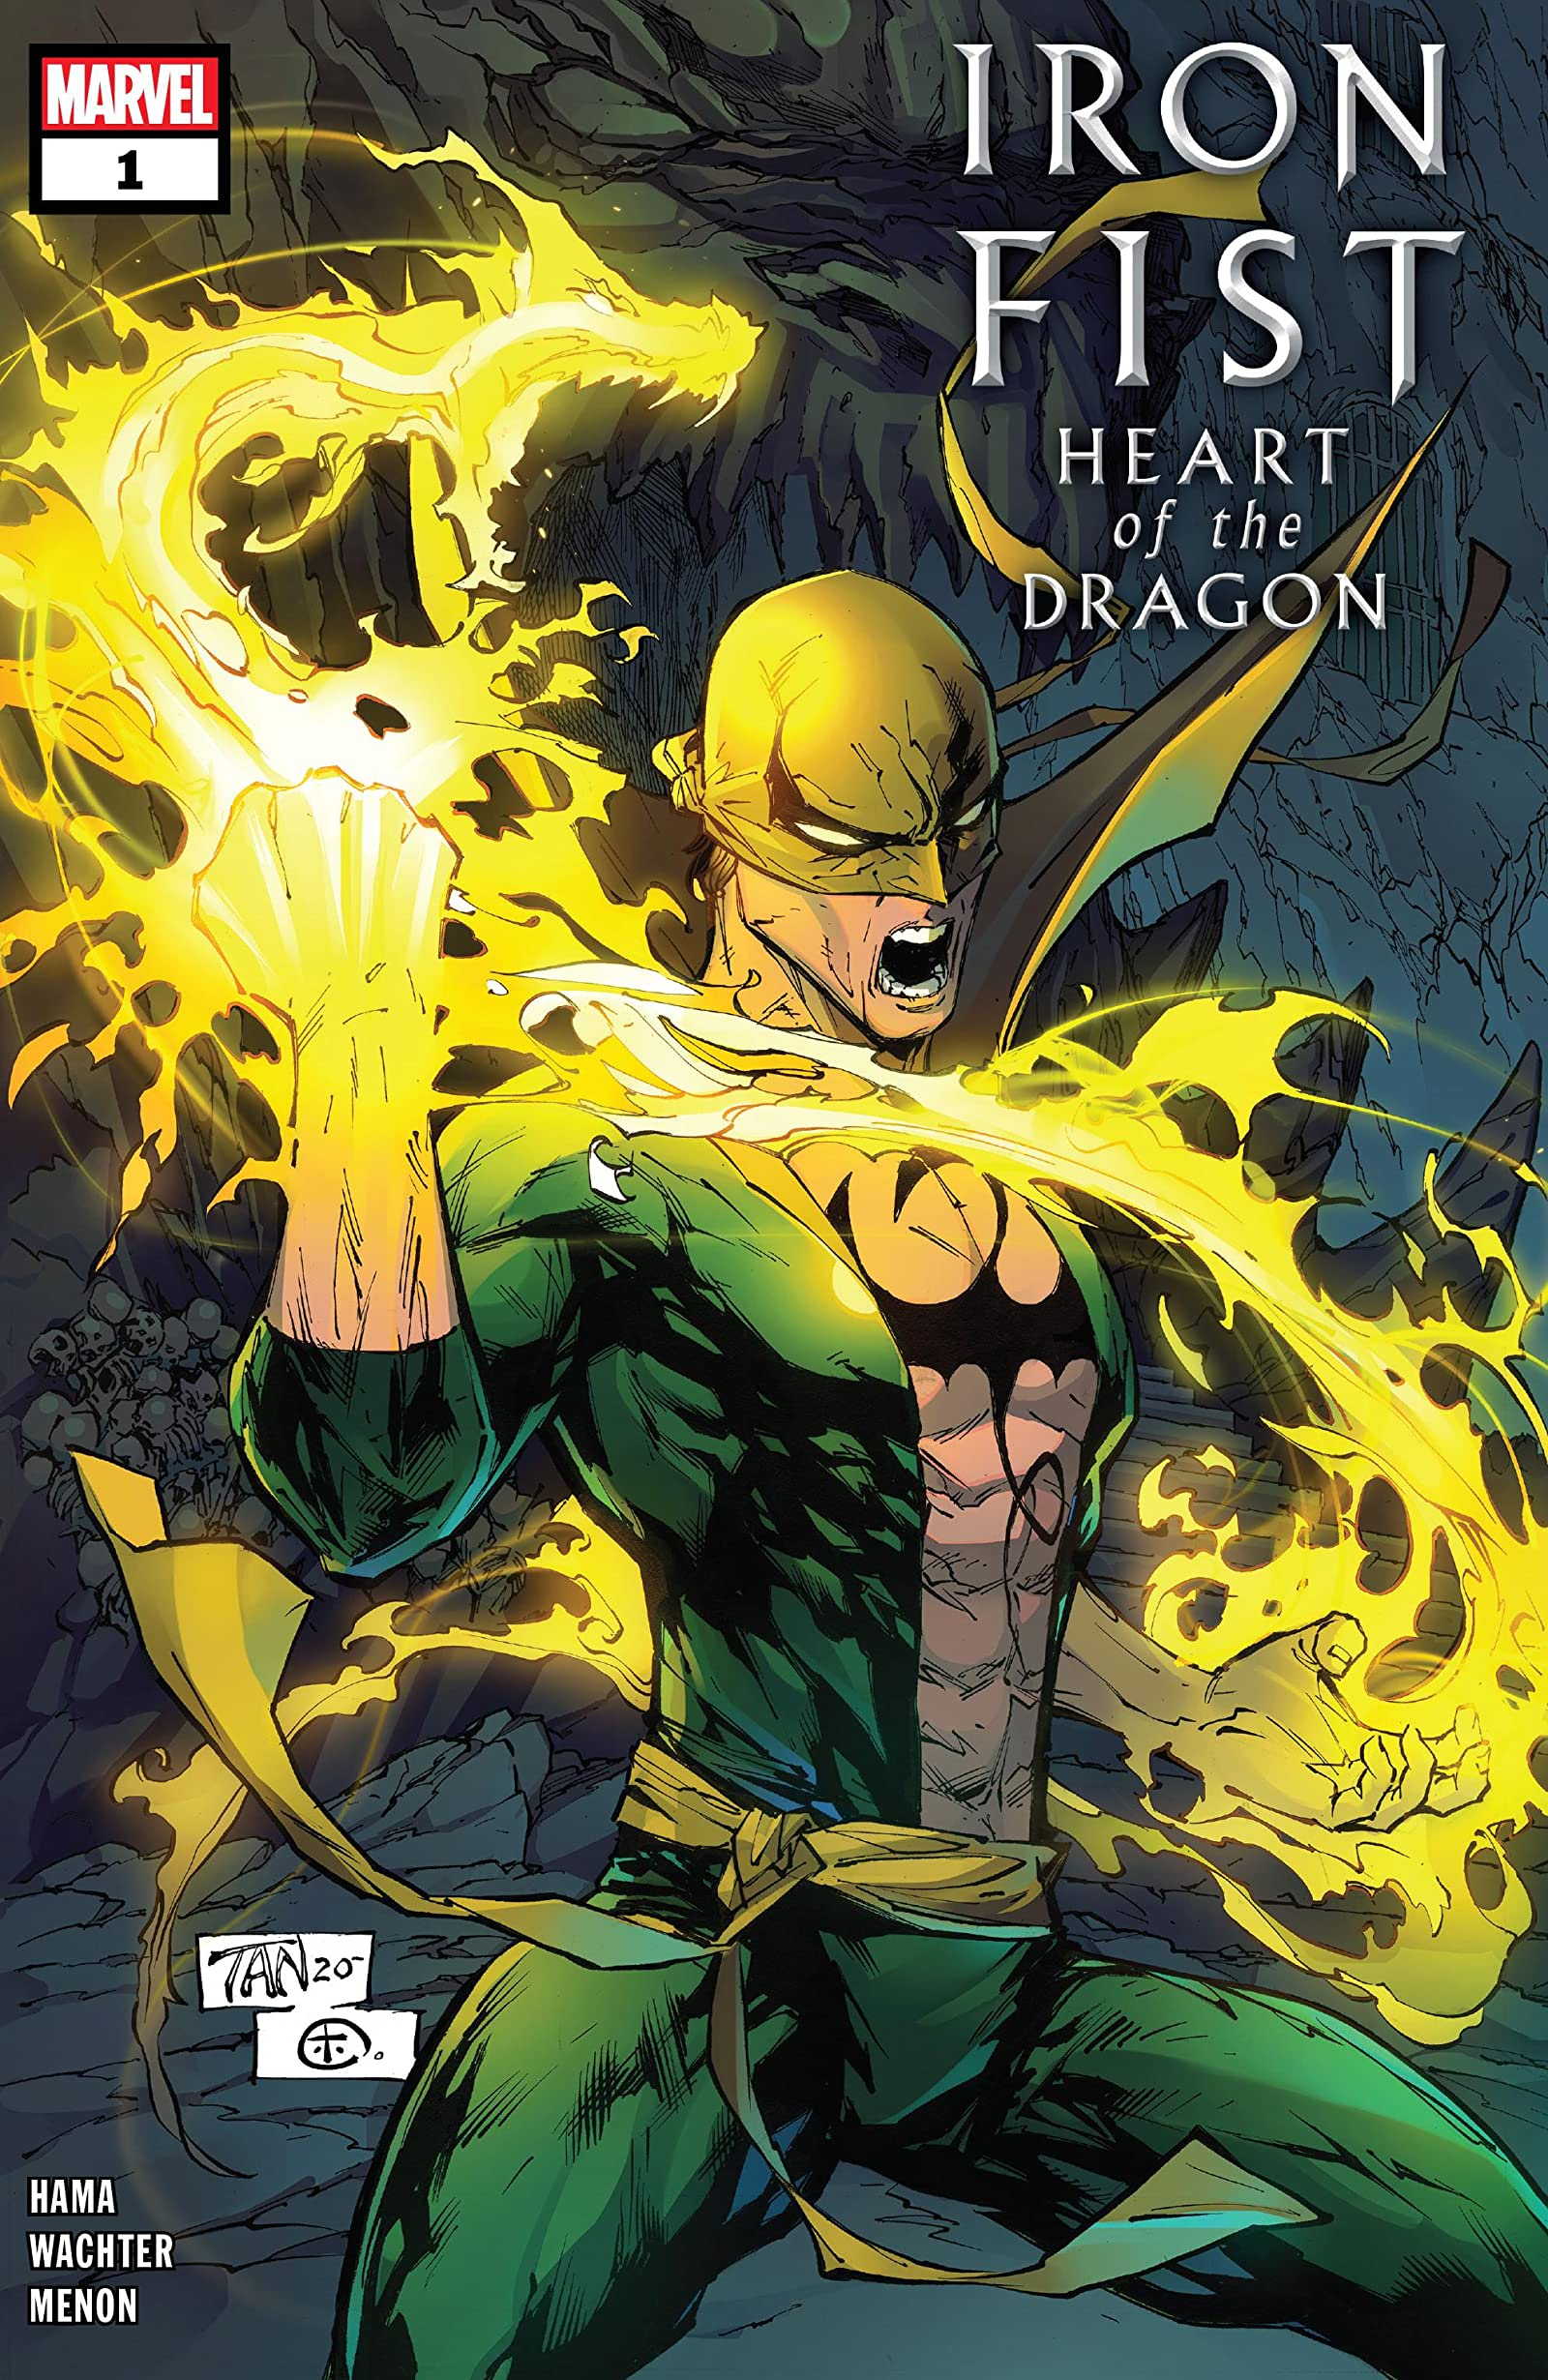 Iron Fist: Heart of the Dragon Vol 1 1